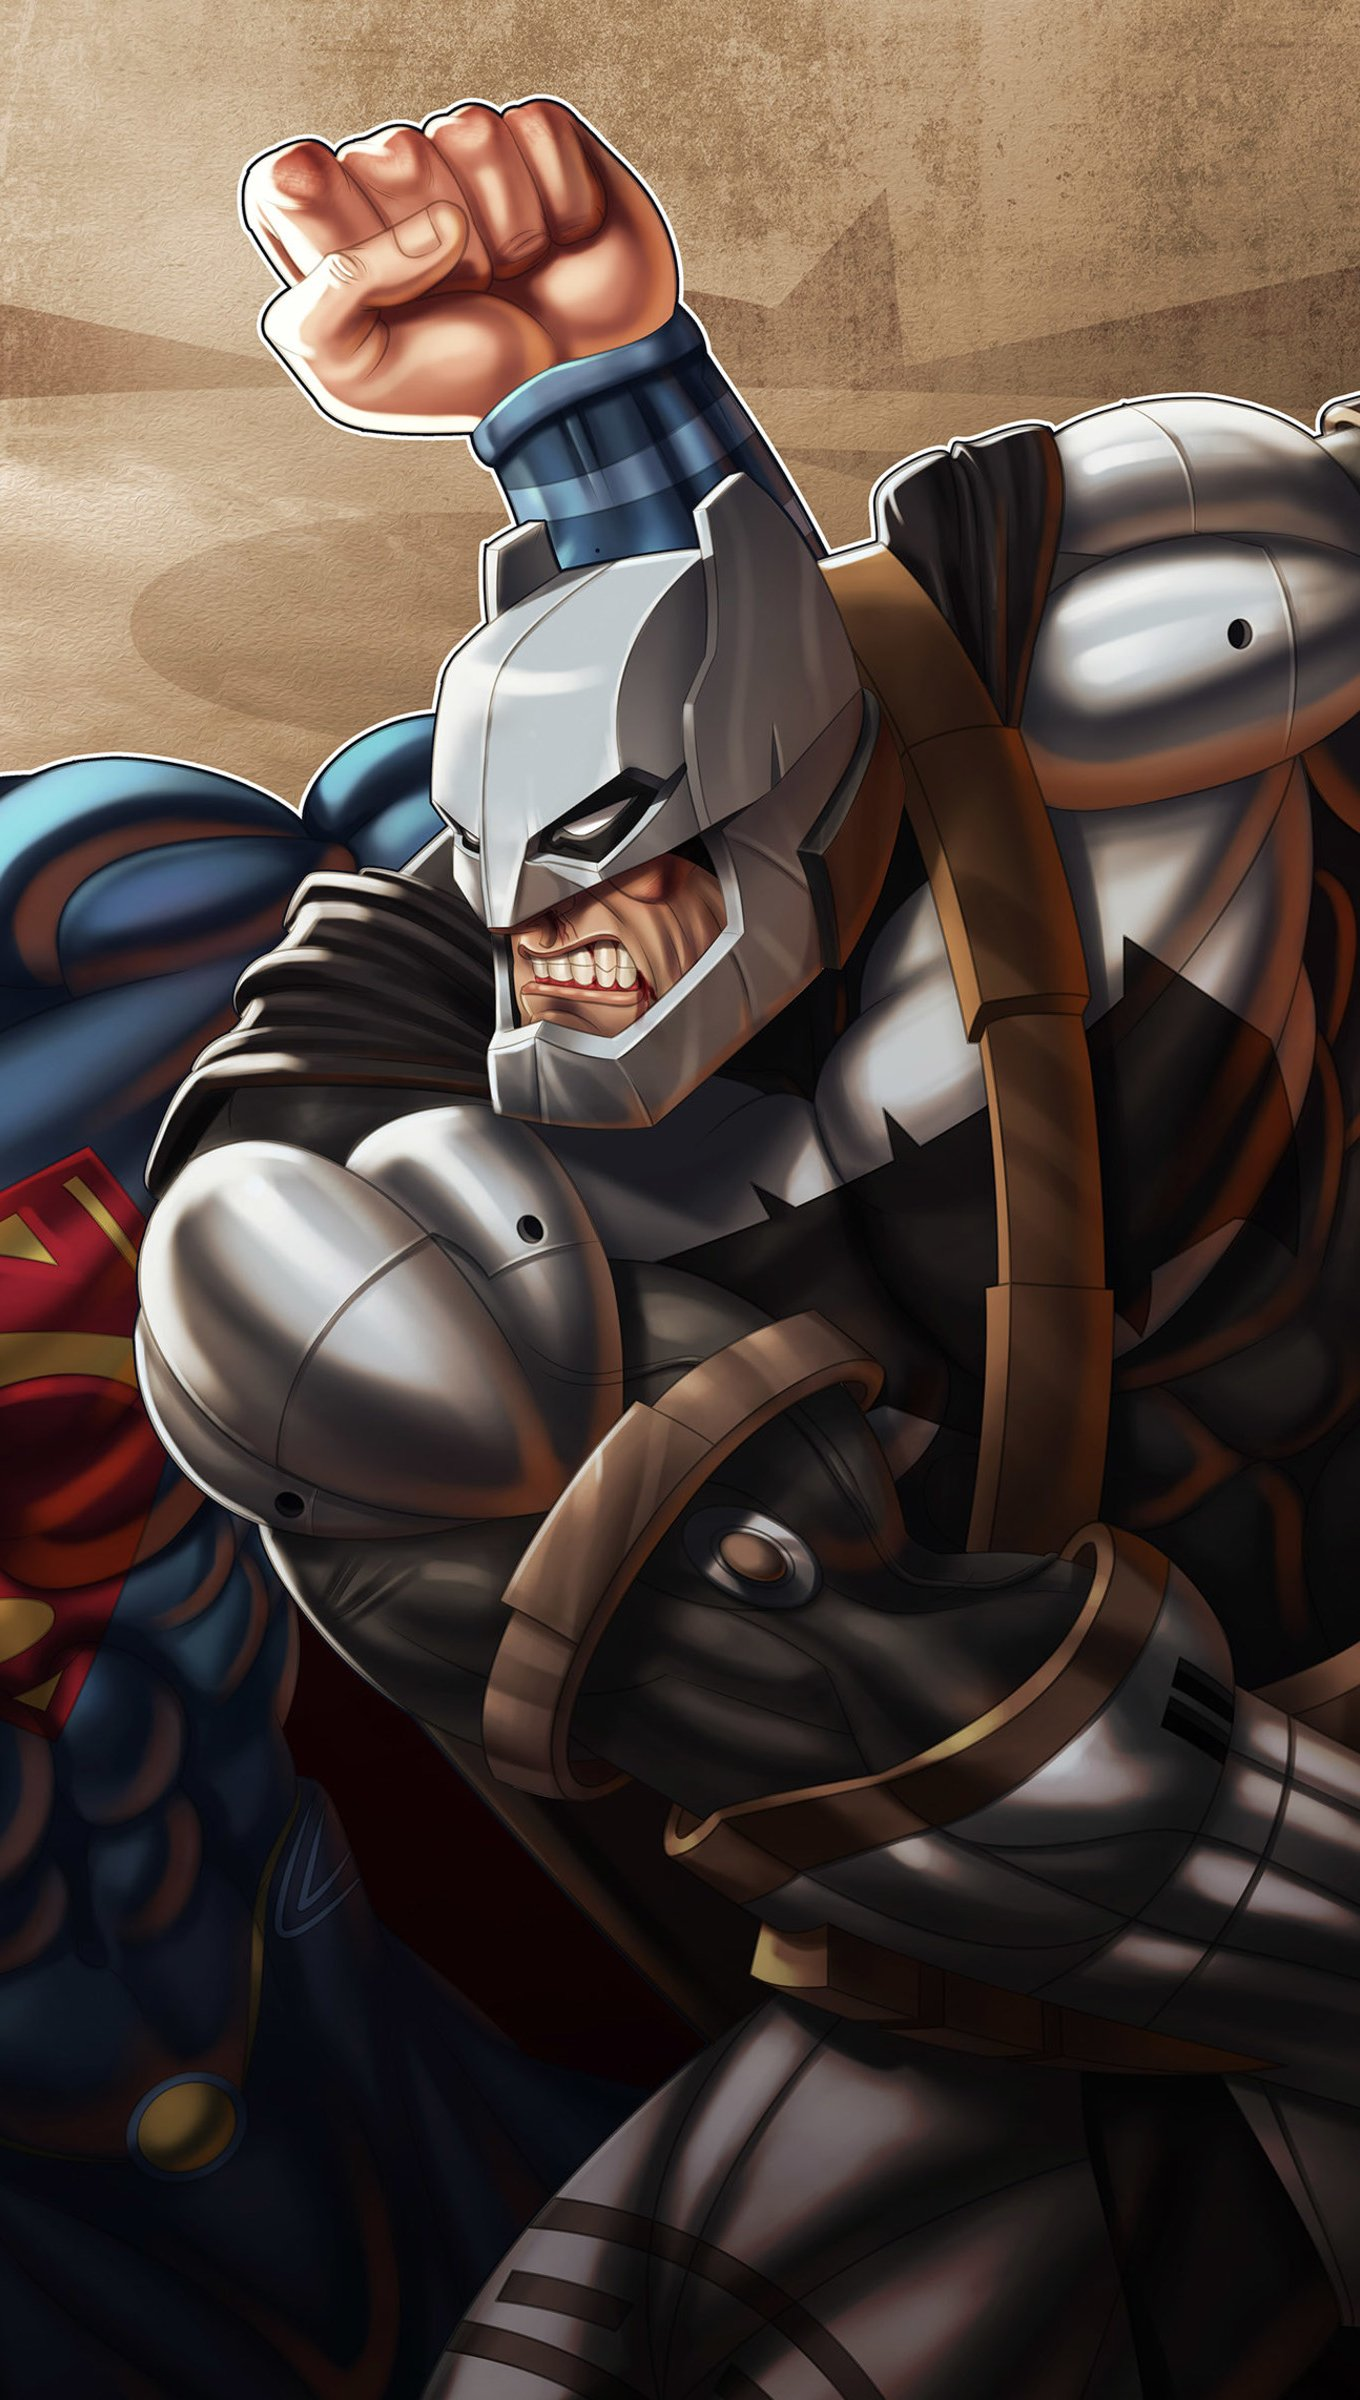 Fondos de pantalla Batman derrotando a Superman Vertical